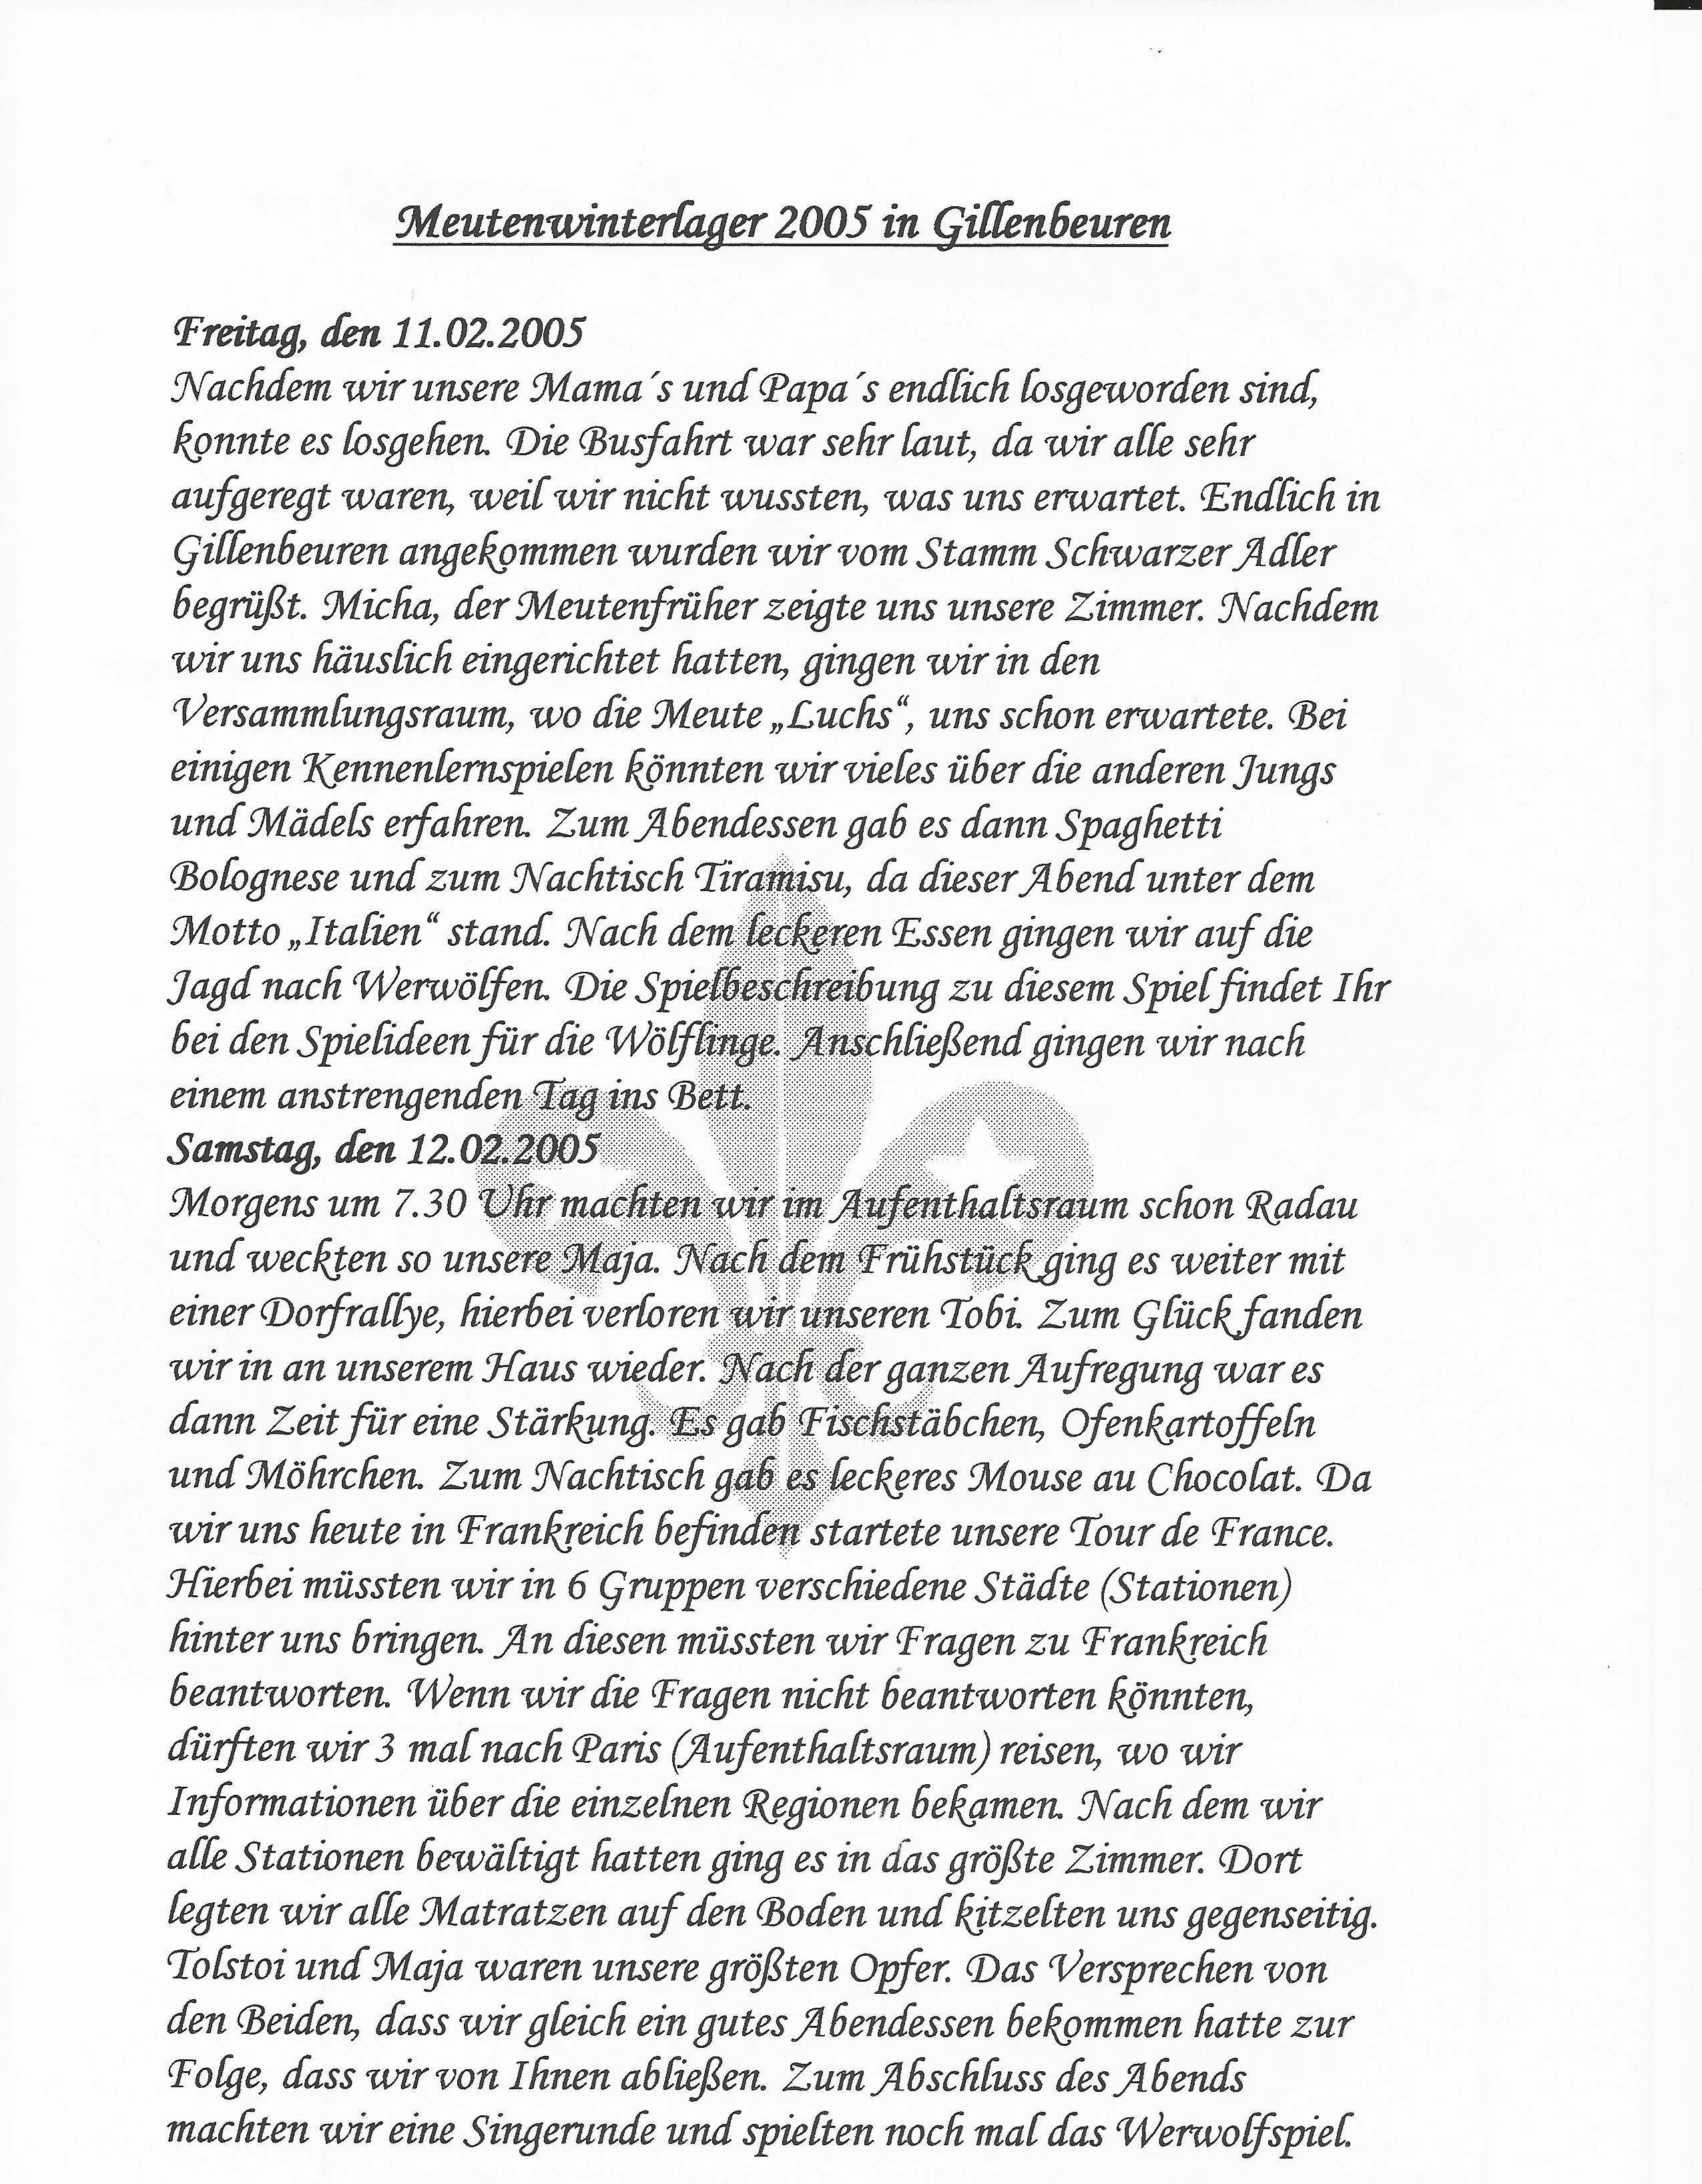 MeuWiLa 20050001